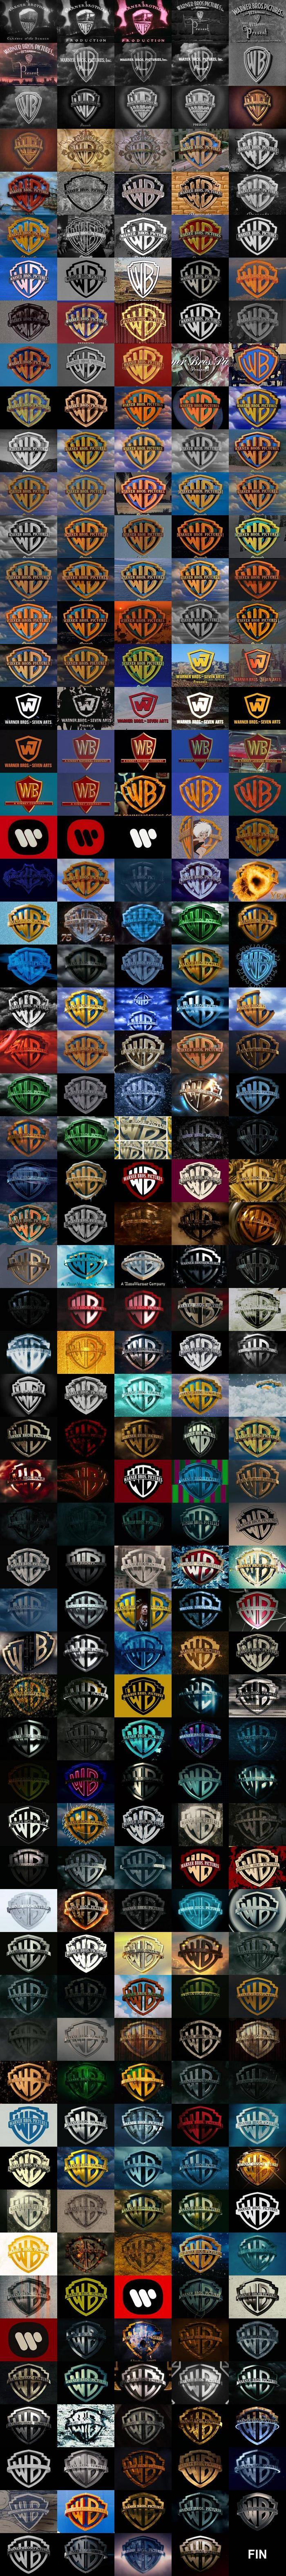 Warner Bros Logo History (1923 - 2014)